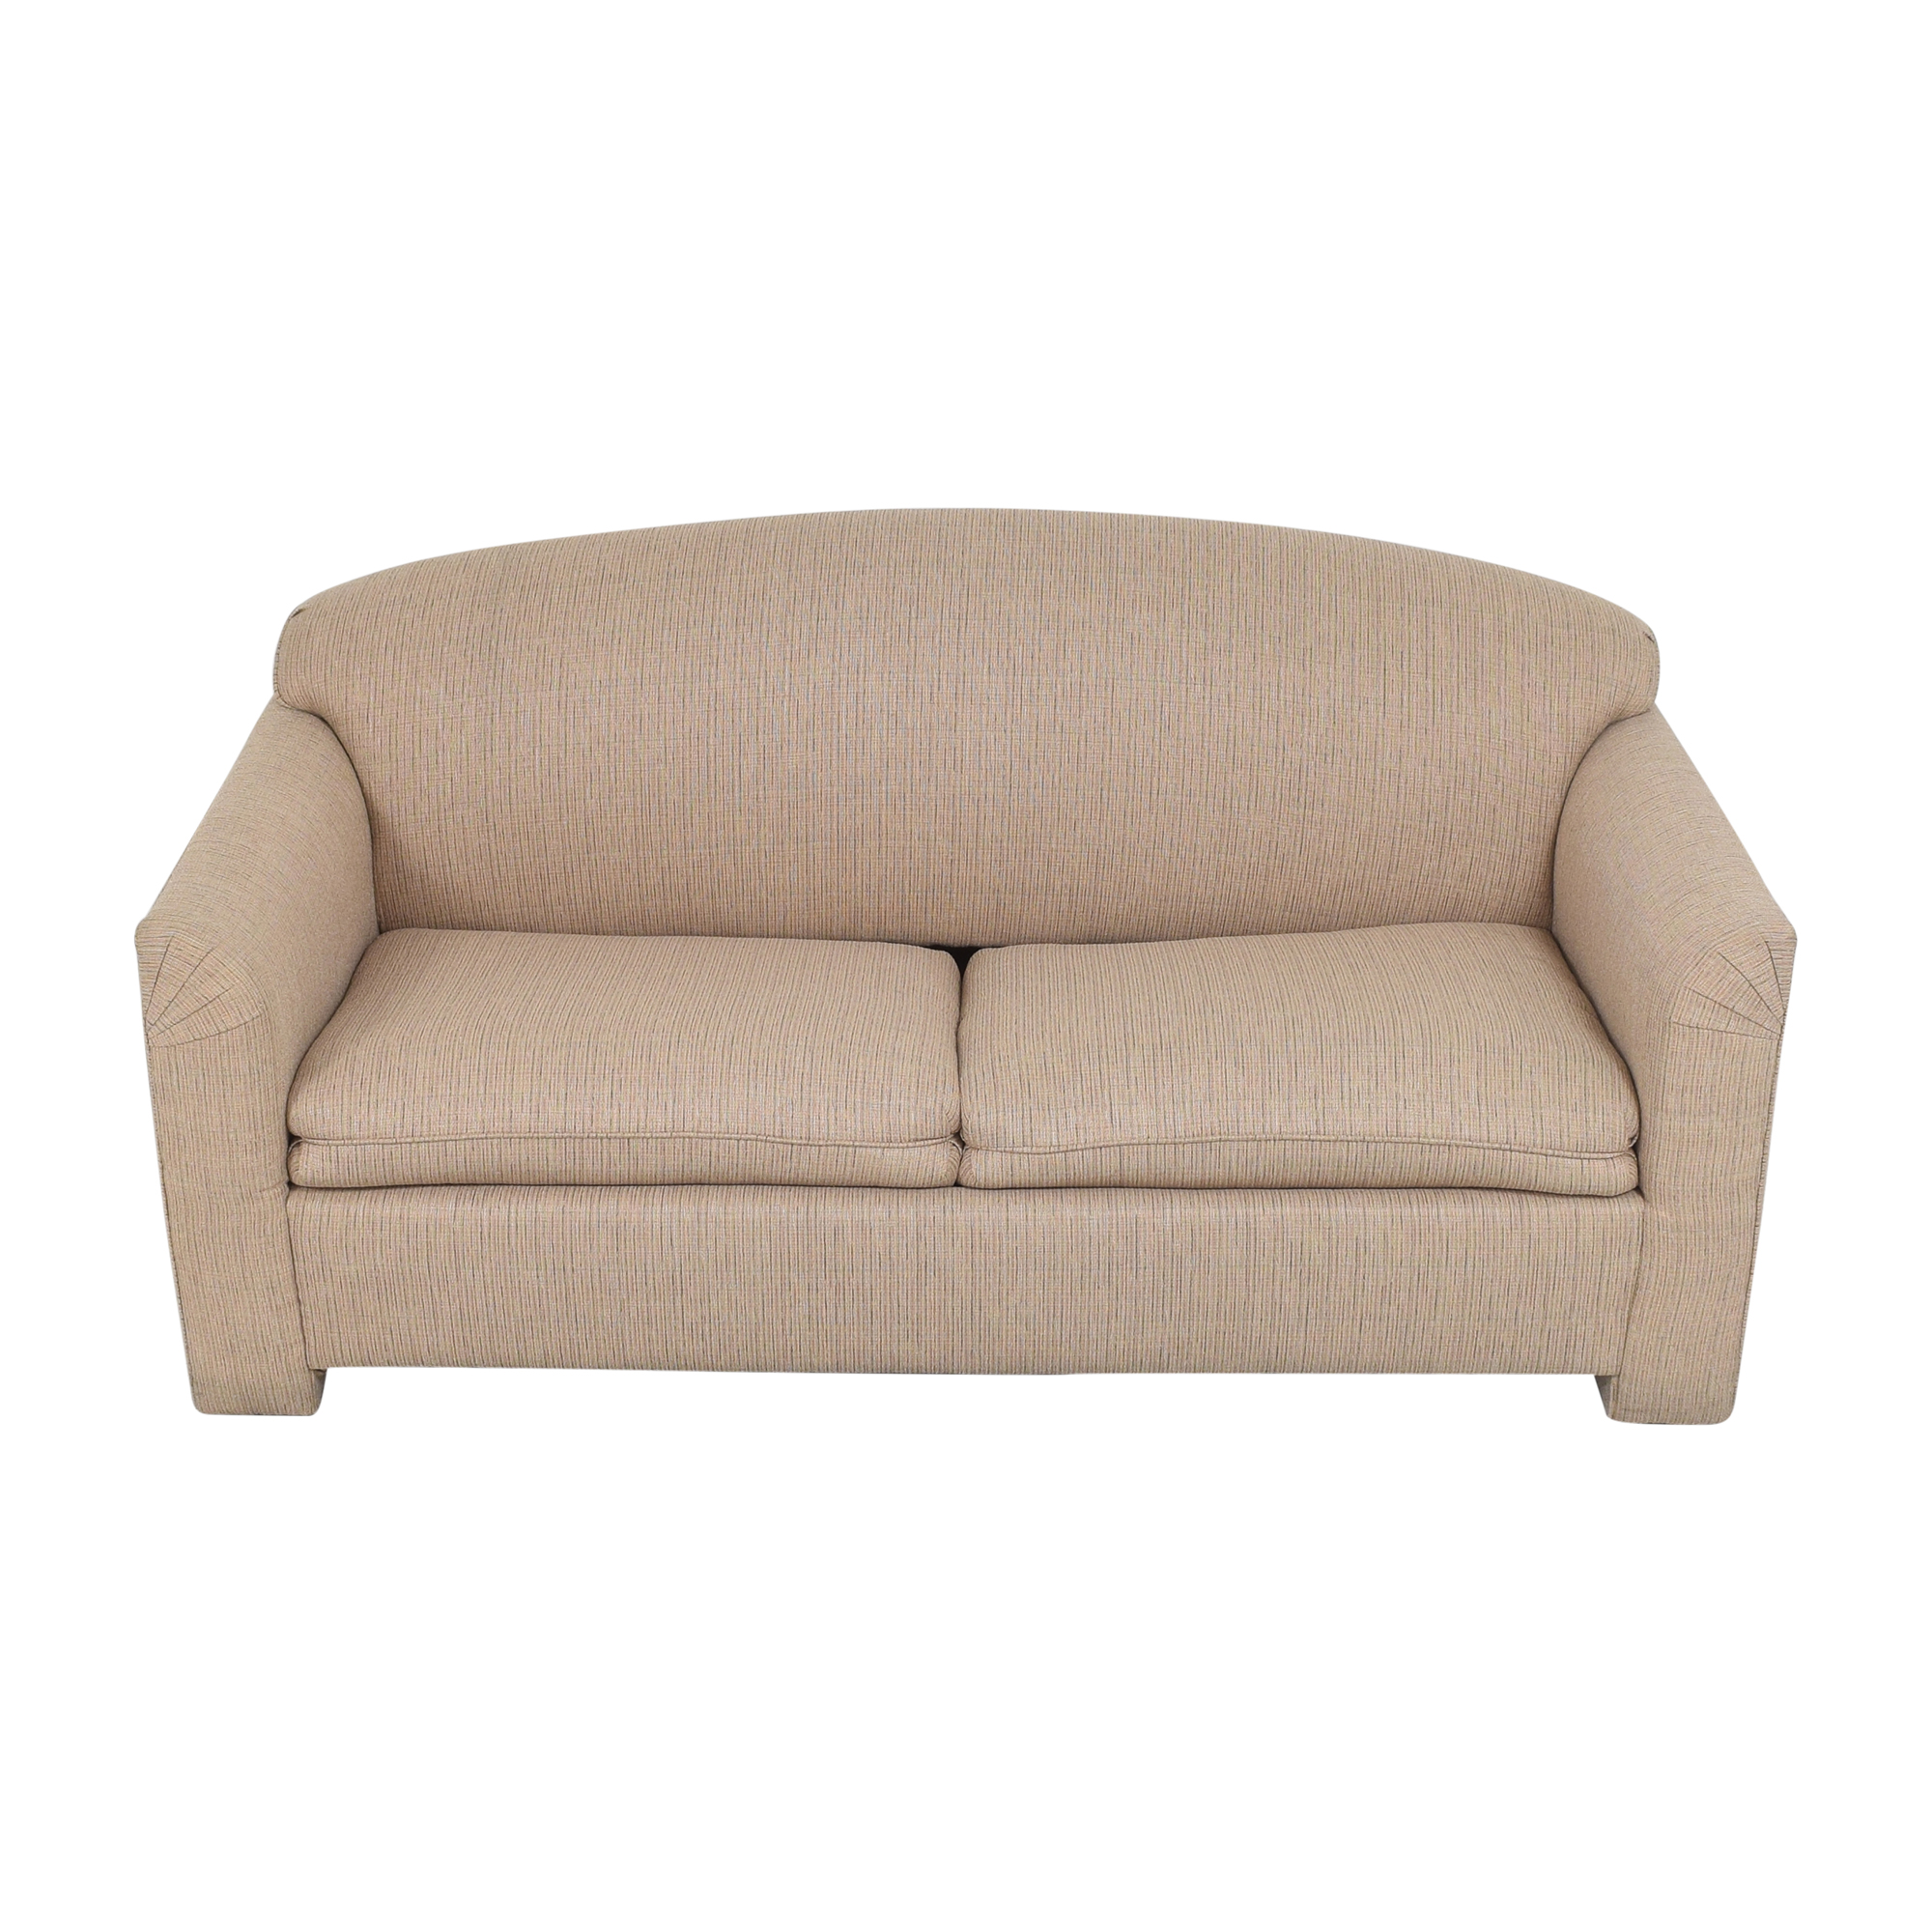 Simmons Simmons Two Cushion Sleeper Sofa on sale